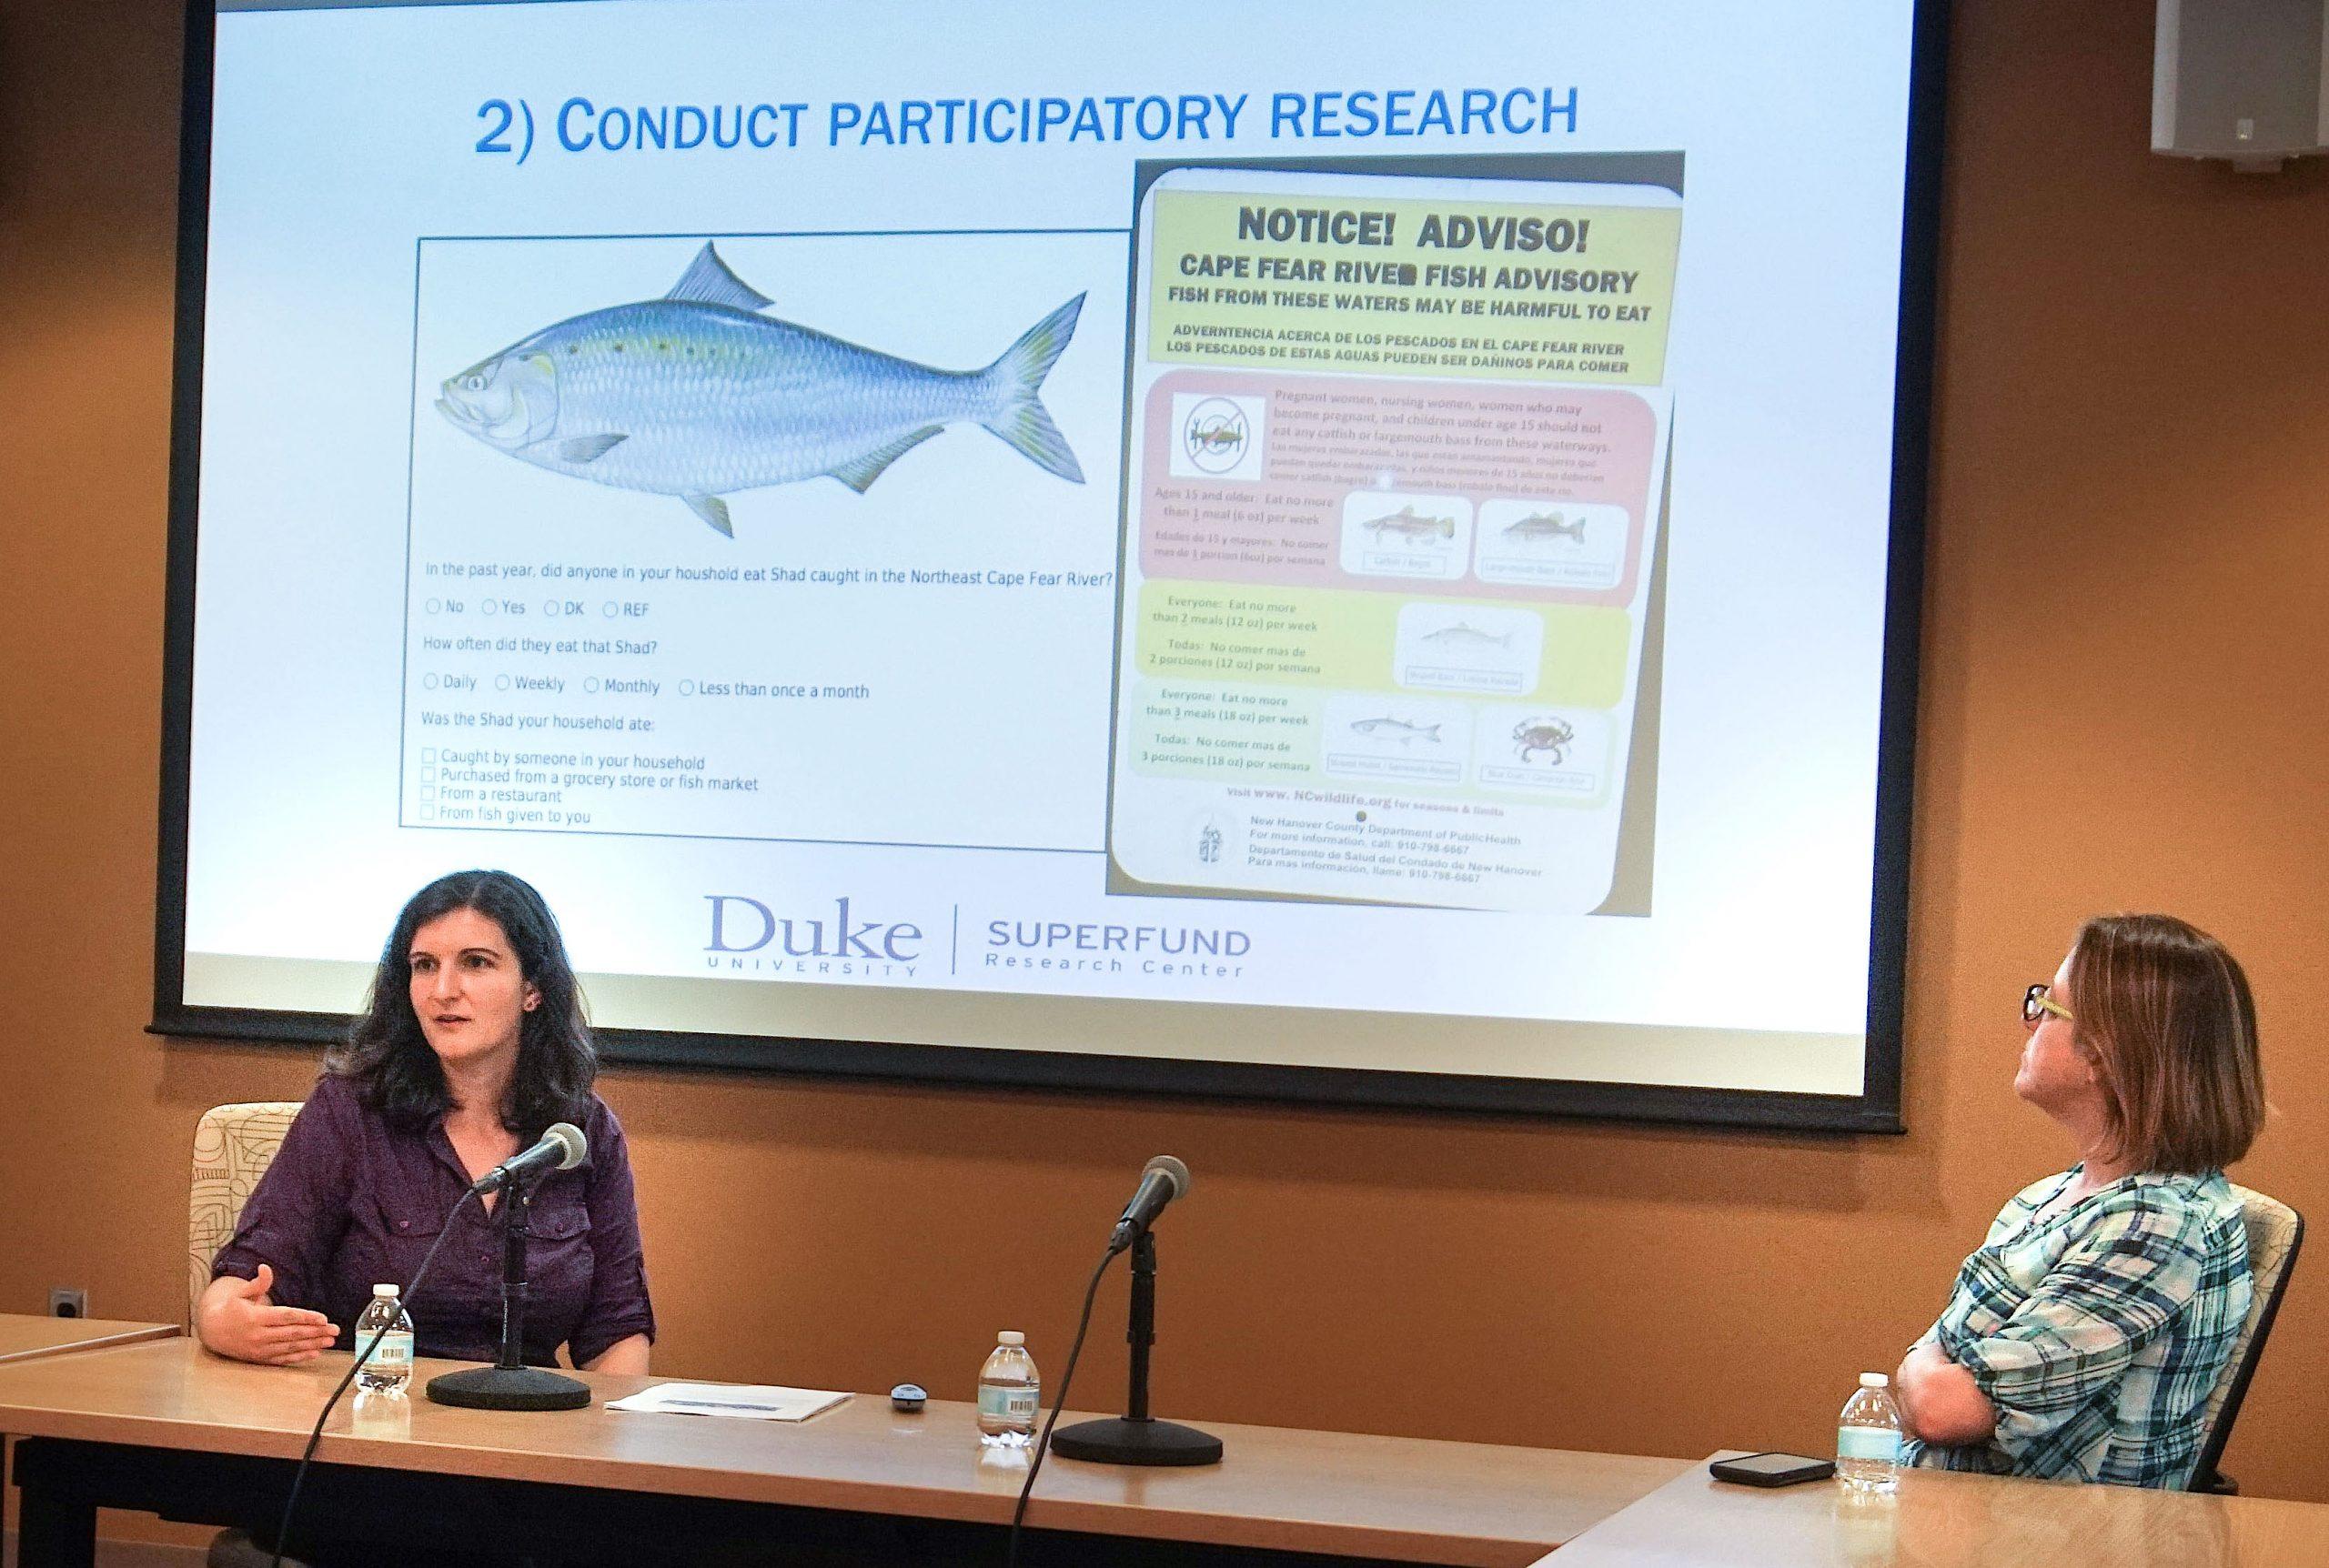 Duke faculty giving a power point presentation at a talk